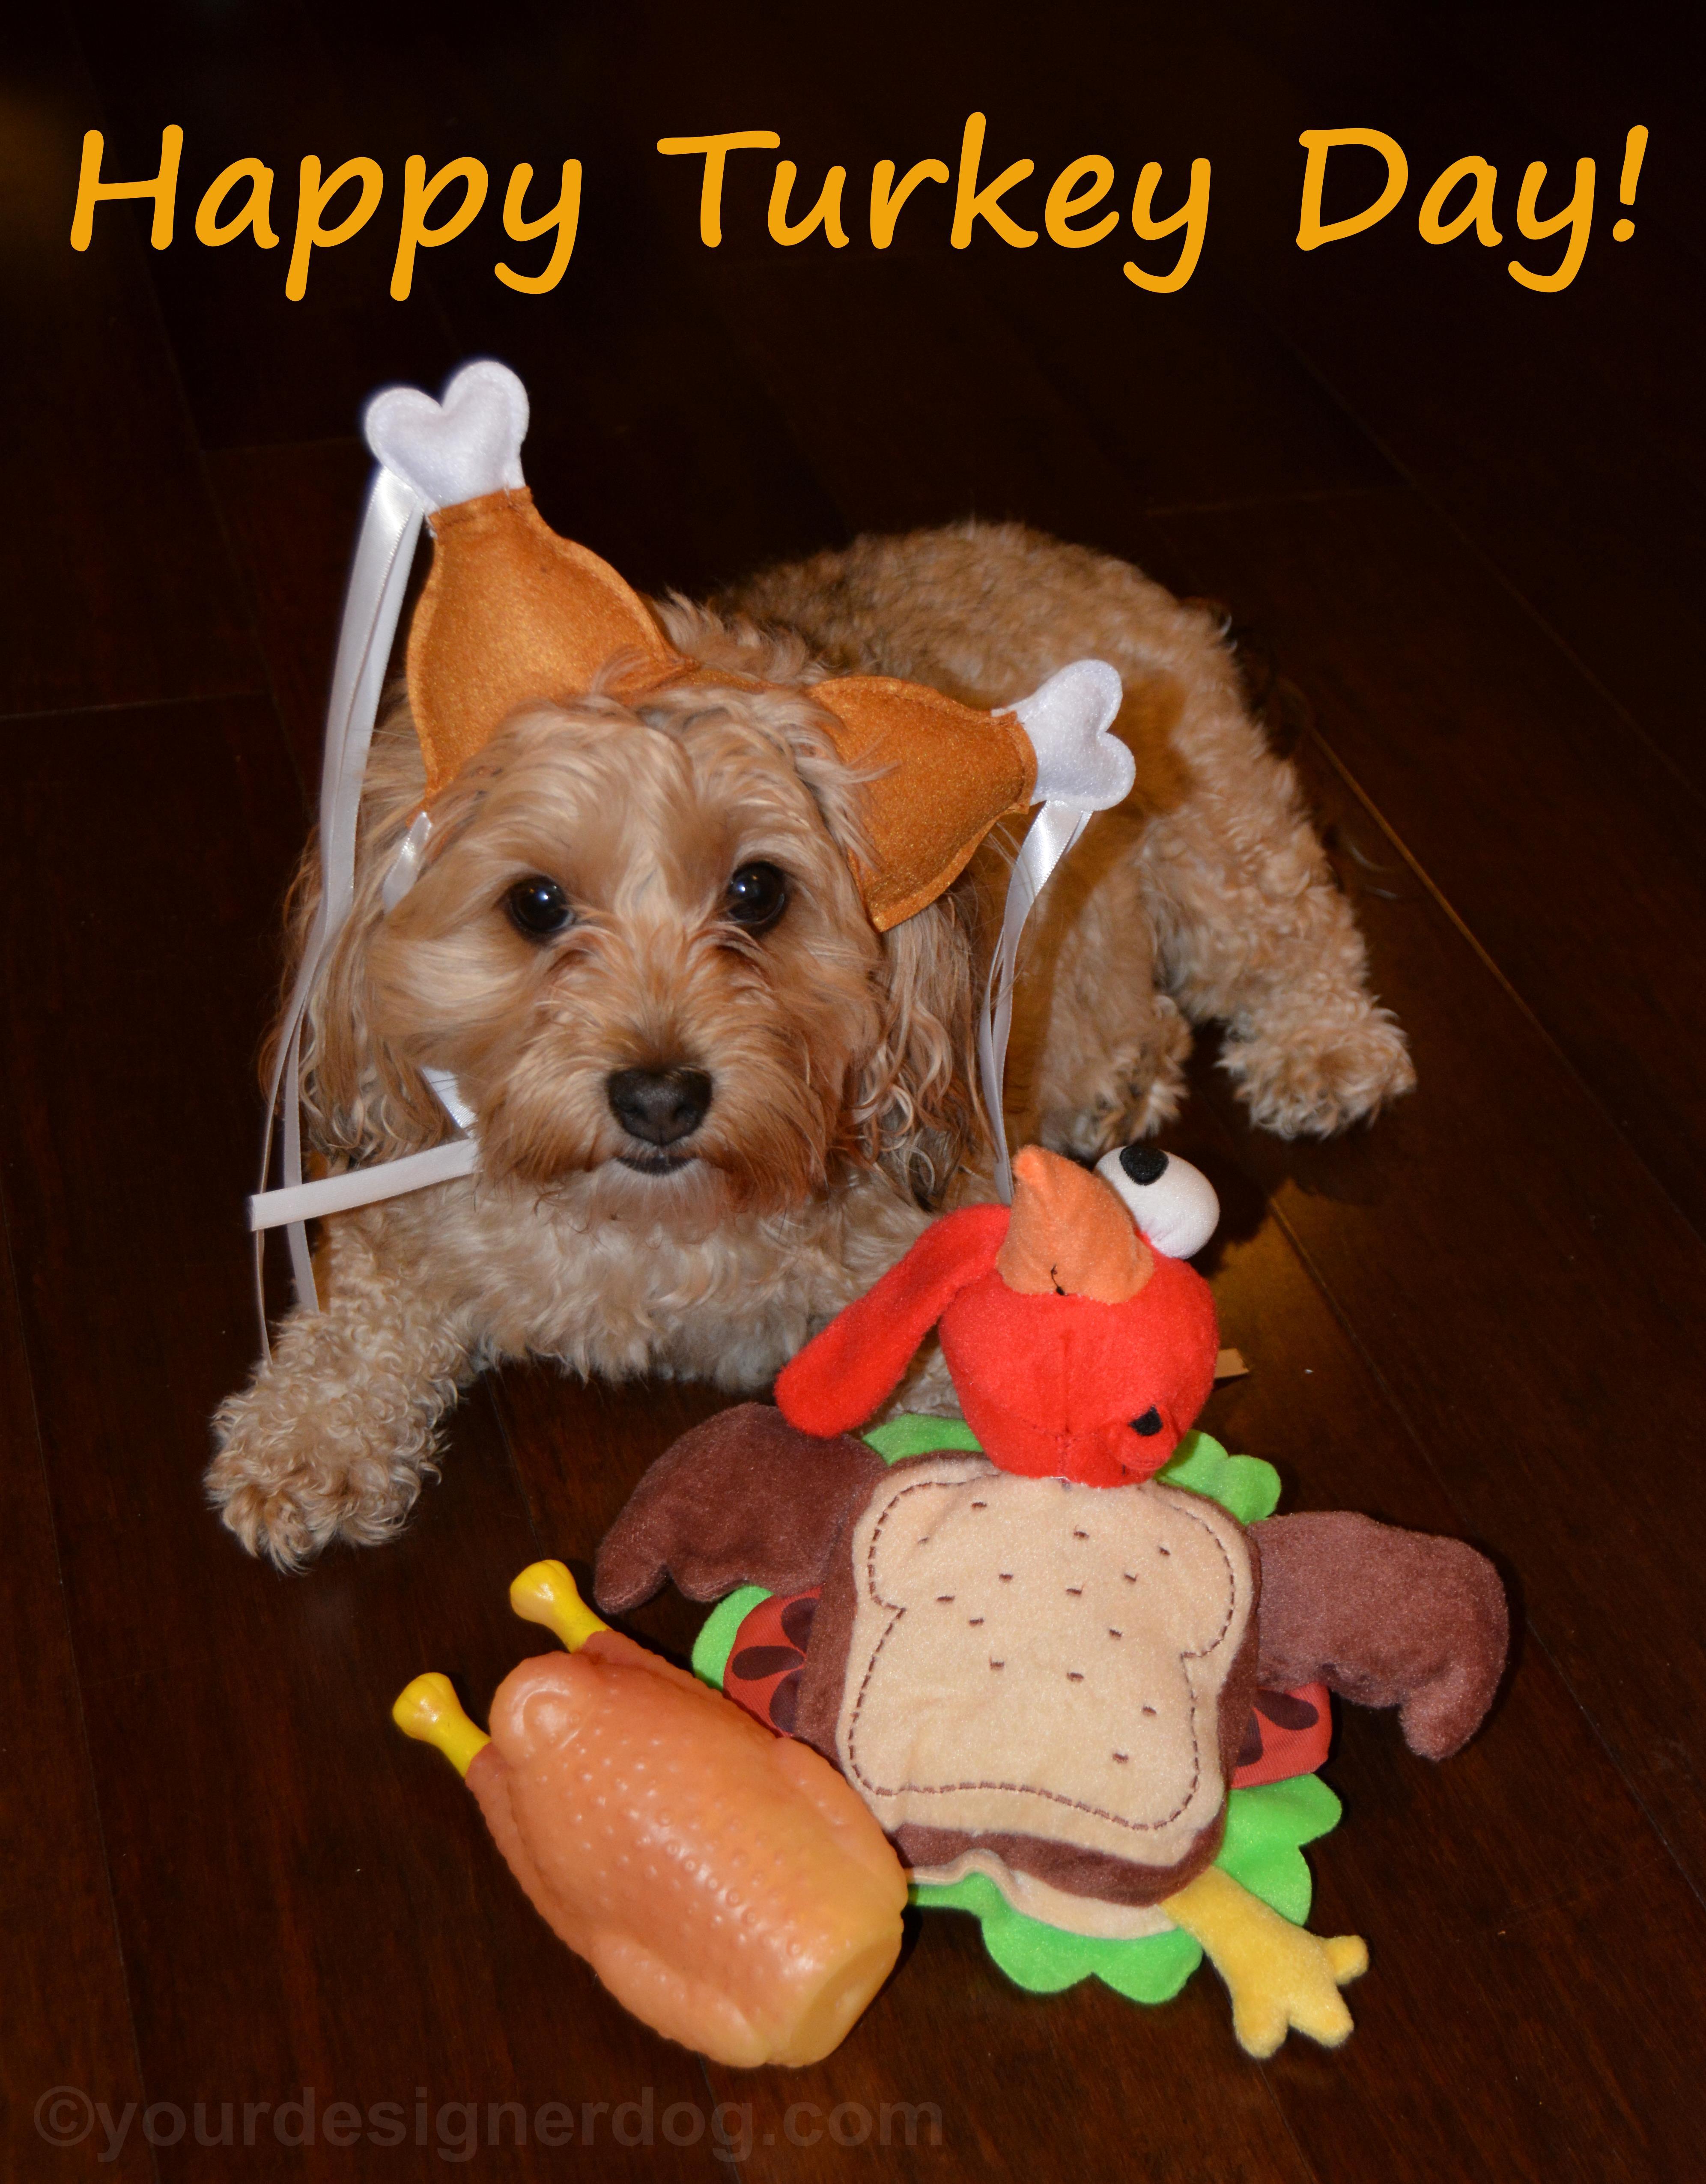 Turkey Day Hercules Style: Happy Turkey Day!